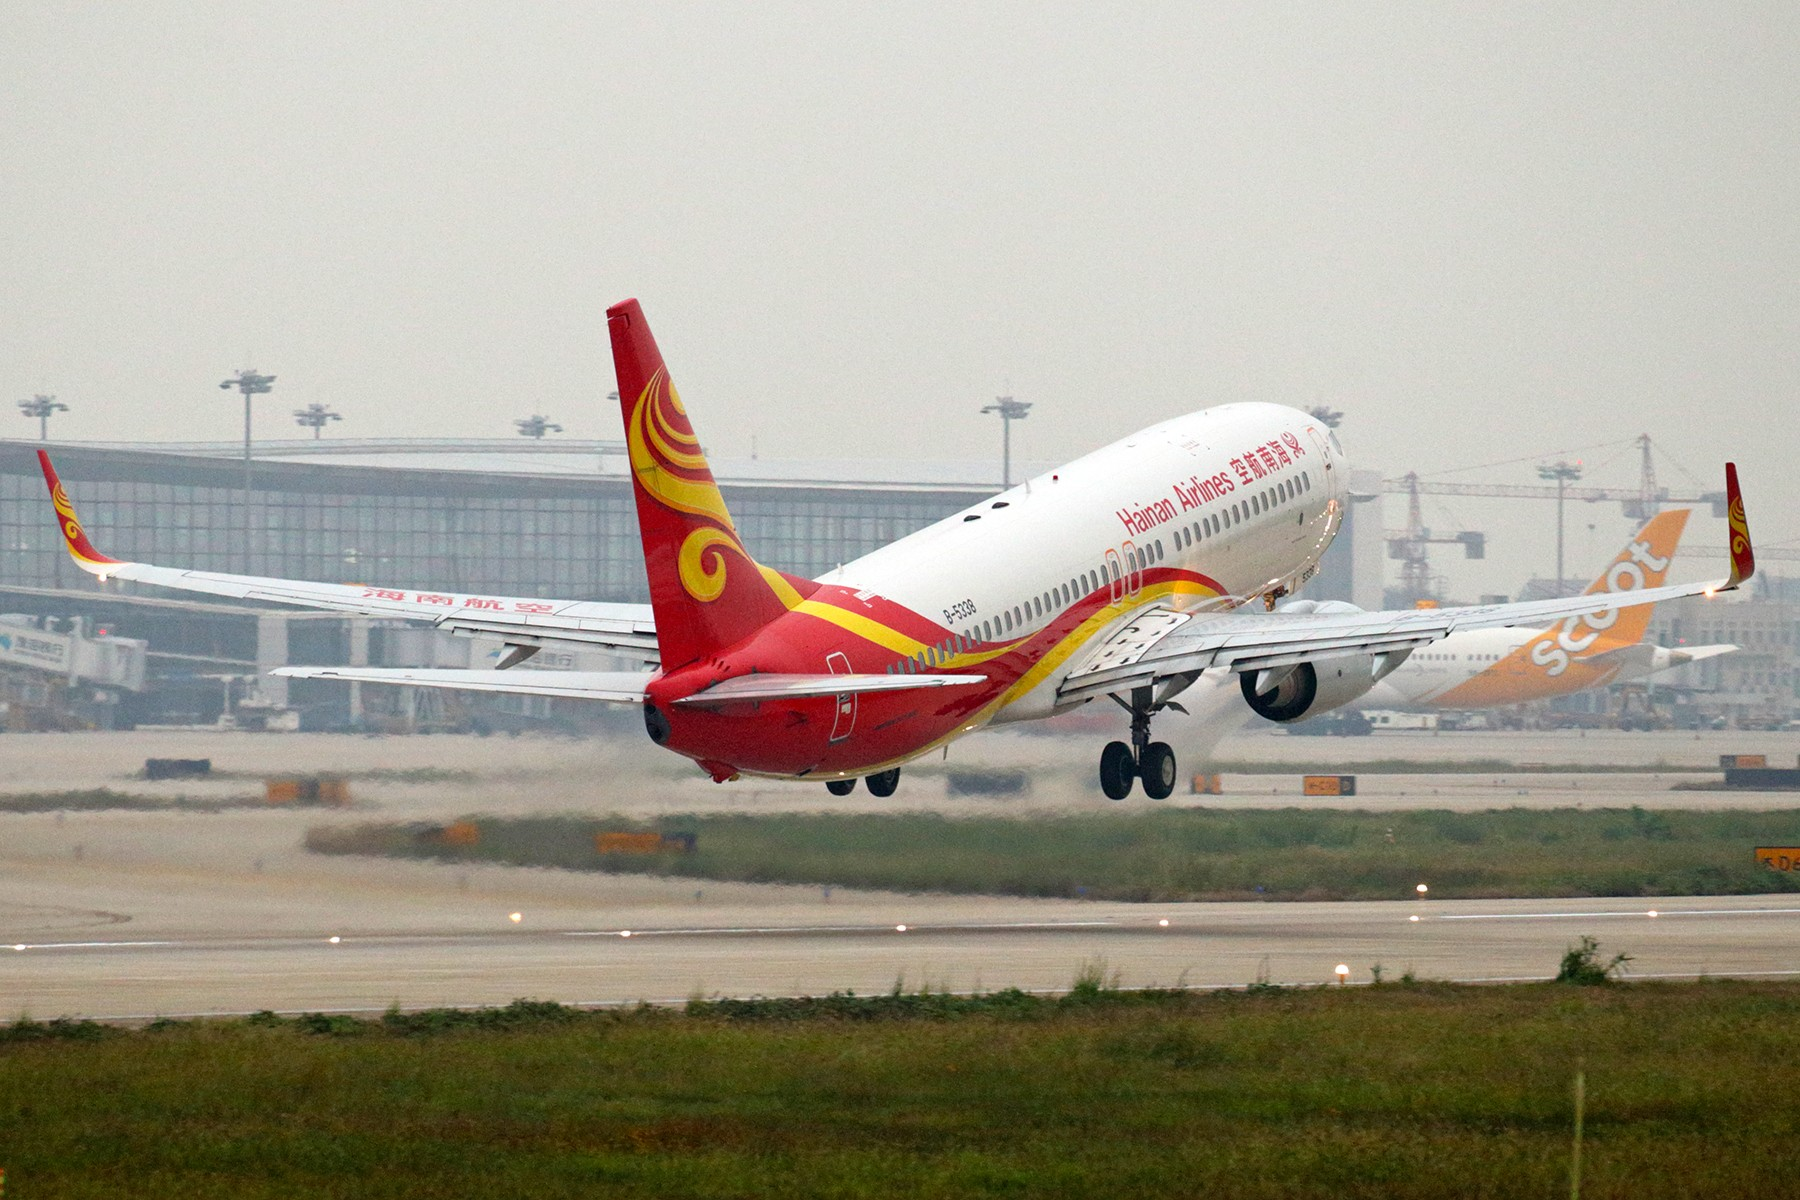 Re:[原创]【BLDDQ】******NKG07/25单跑道运行中****** BOEING 737-800 B-5338 中国南京禄口国际机场